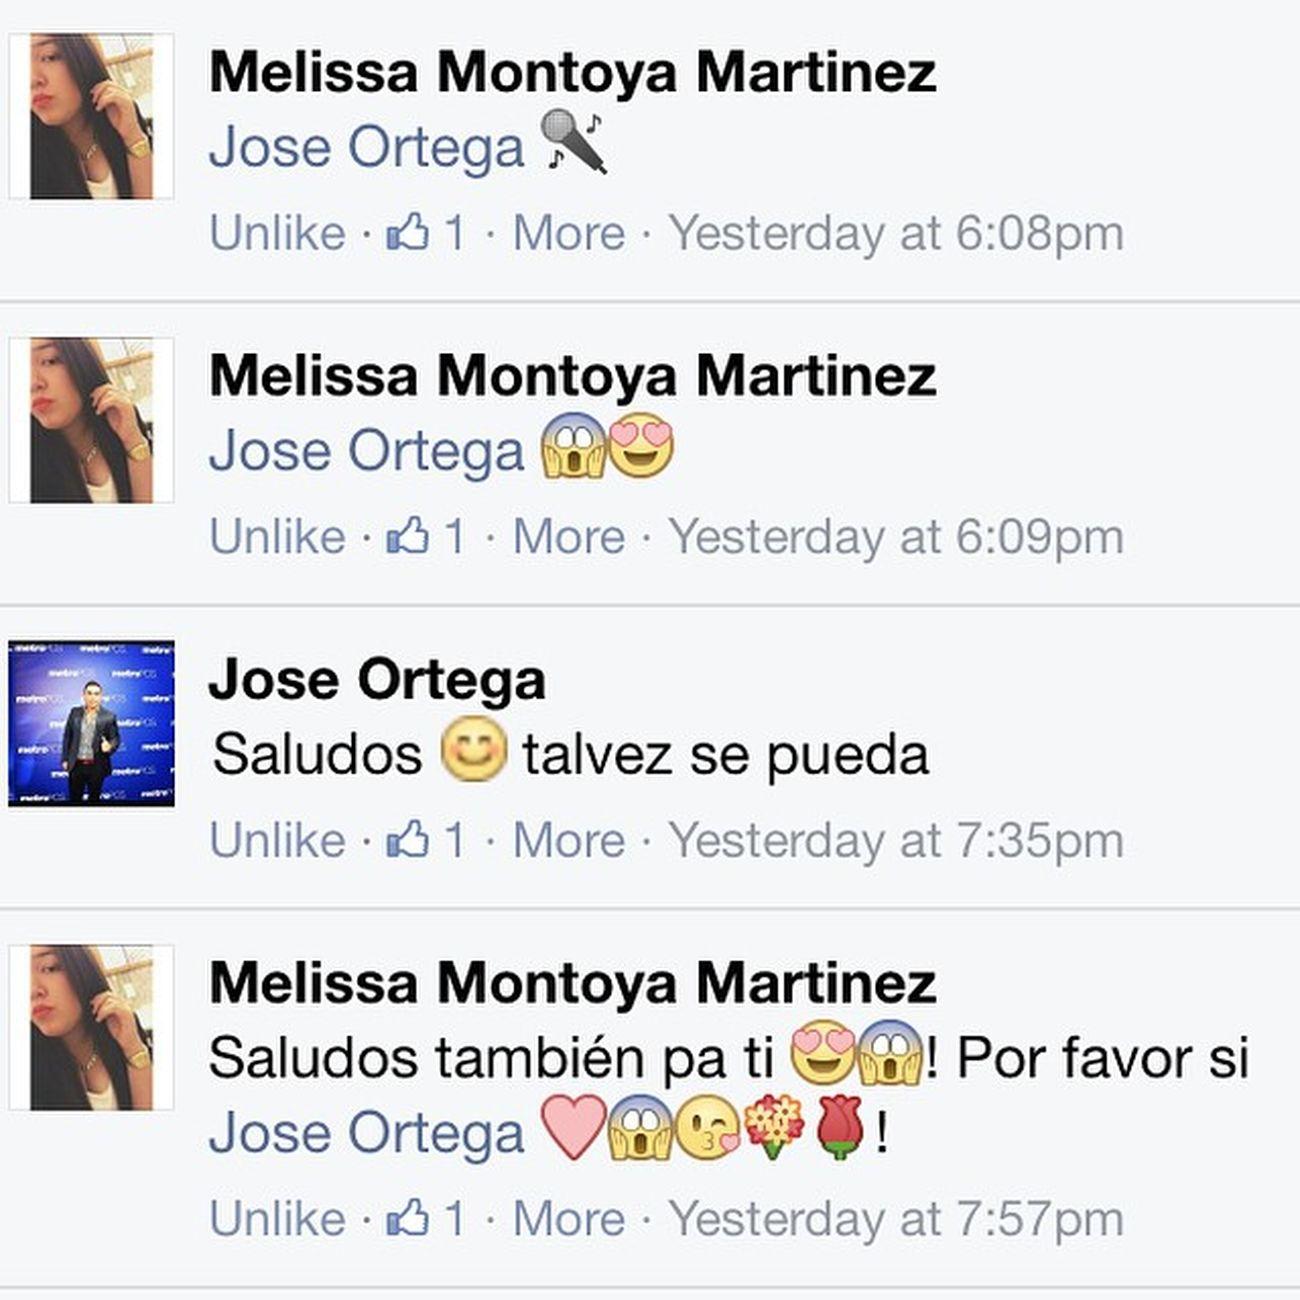 He's the best @joseortegamusica 😘✌️💯🎤! Saludos TeamOrtega 💯🎤💋